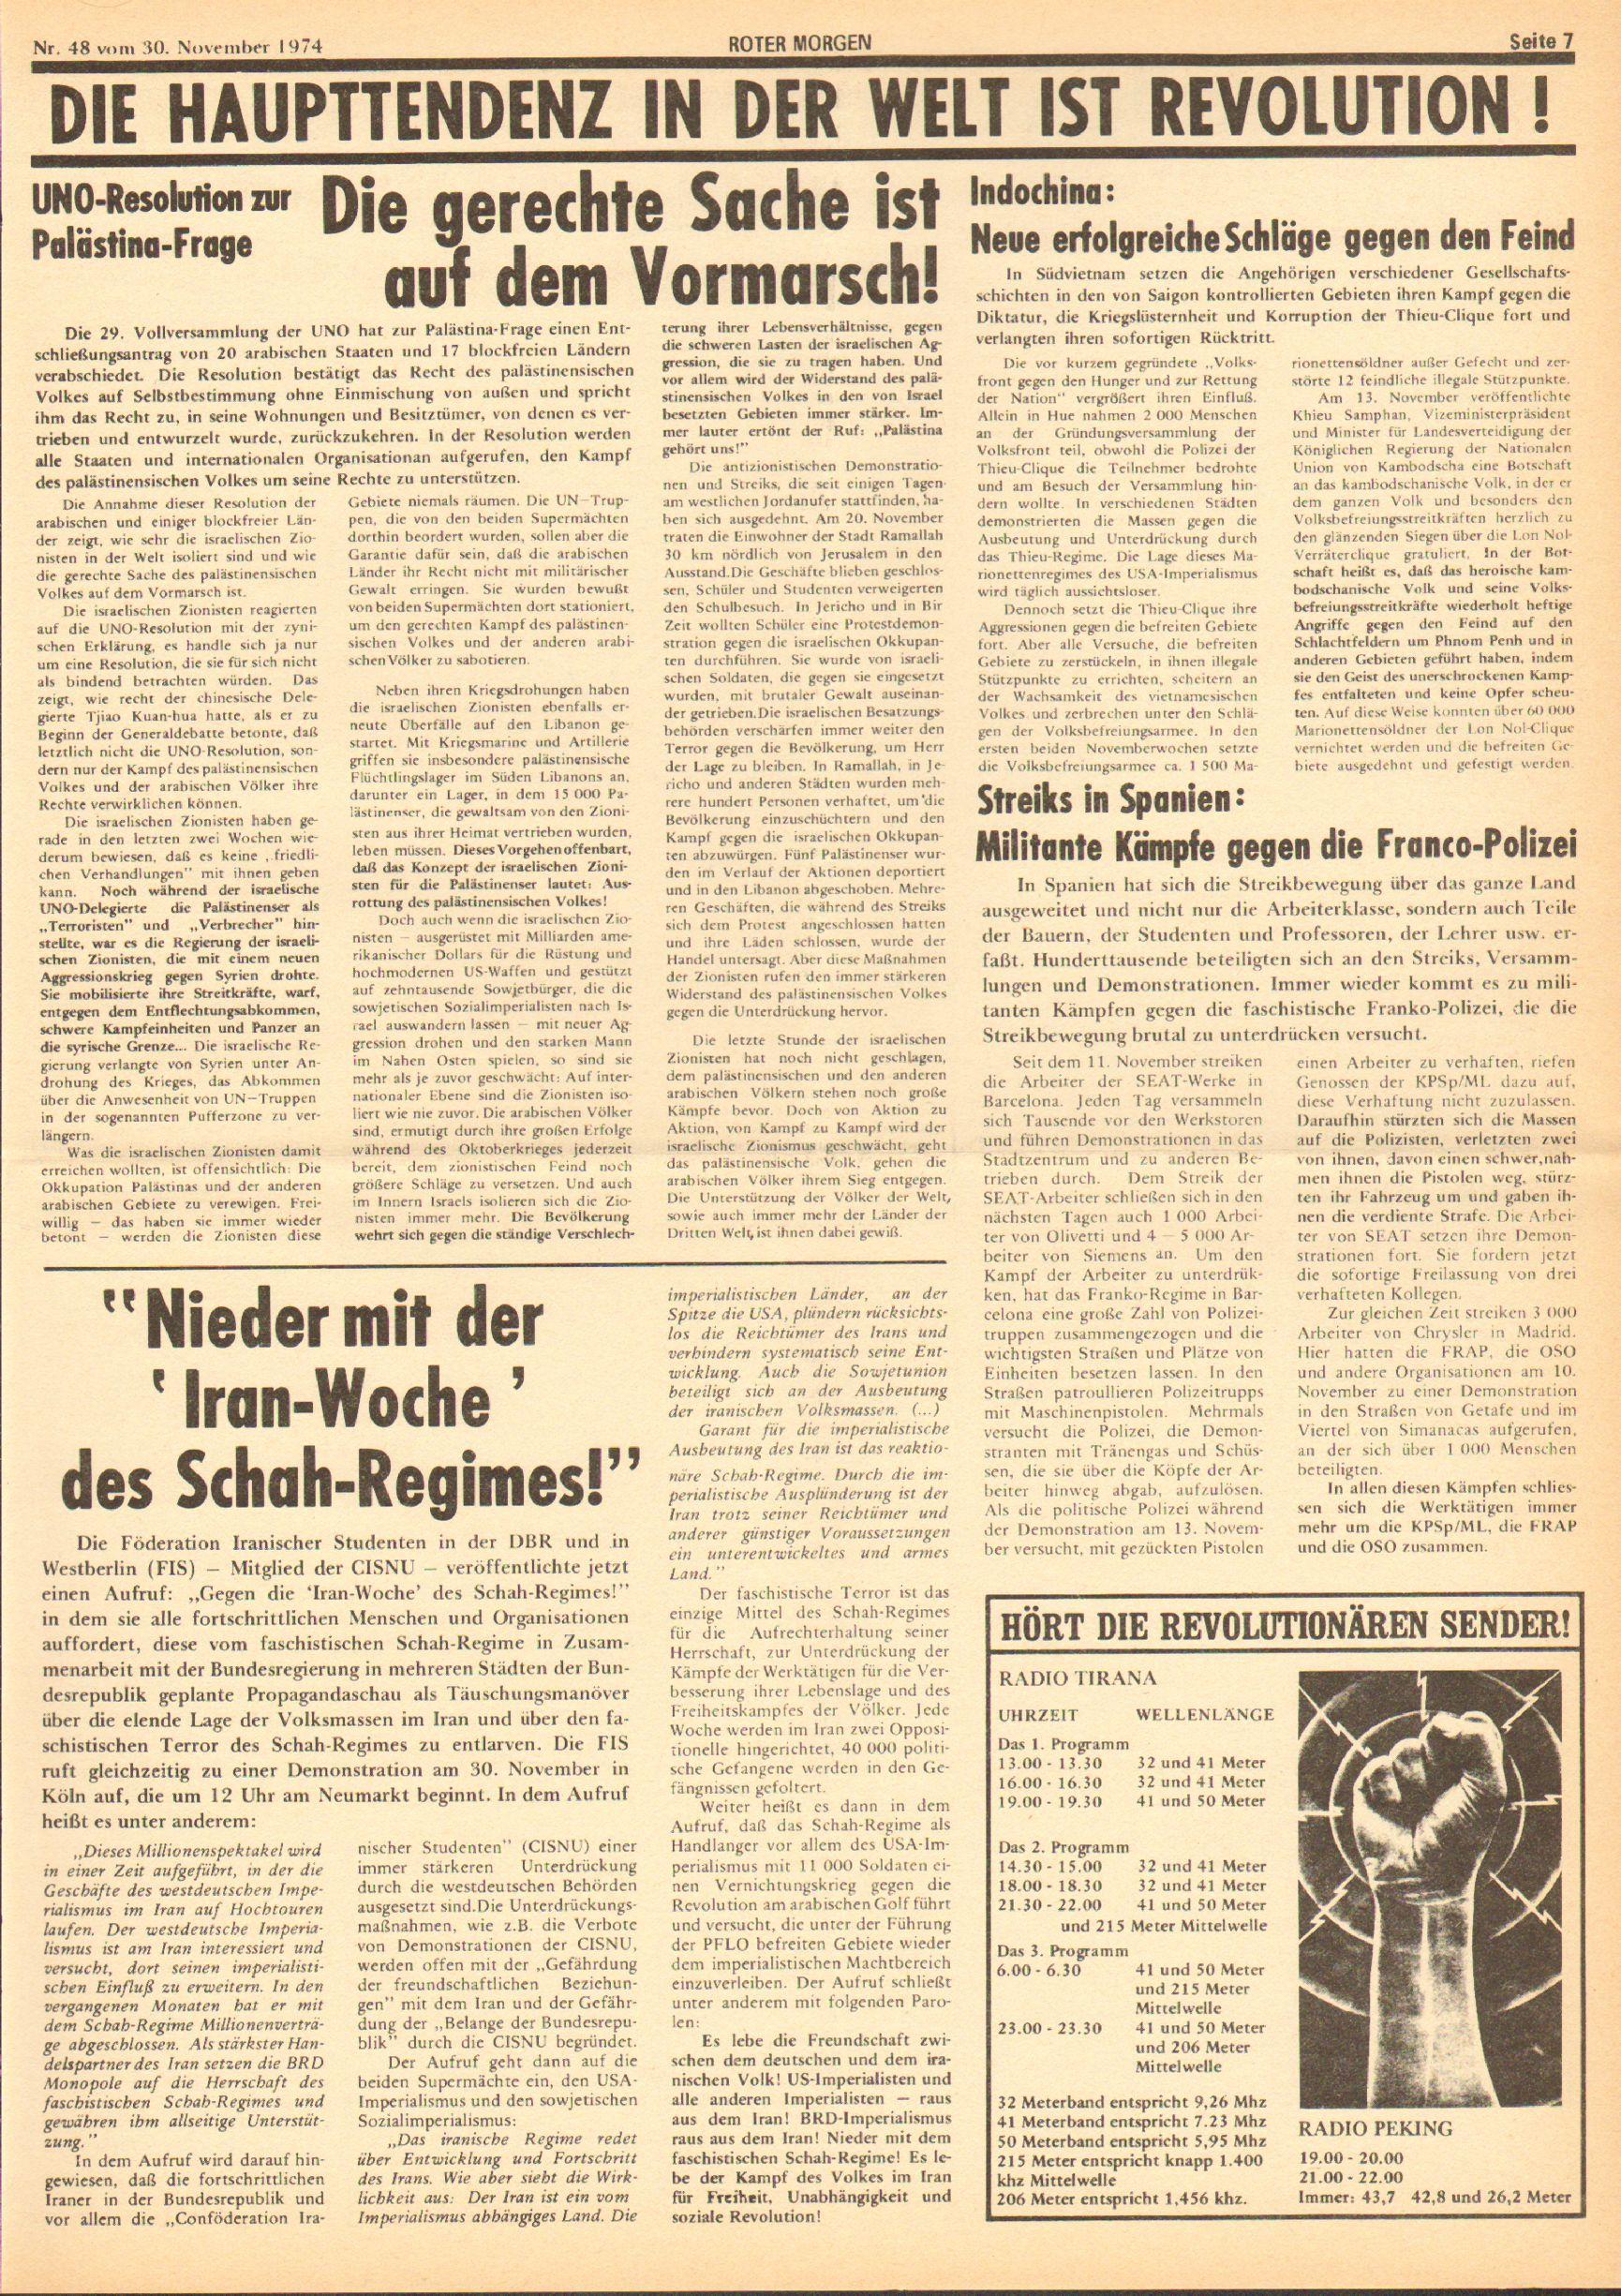 Roter Morgen, 8. Jg., 30. November 1974, Nr. 48, Seite 7